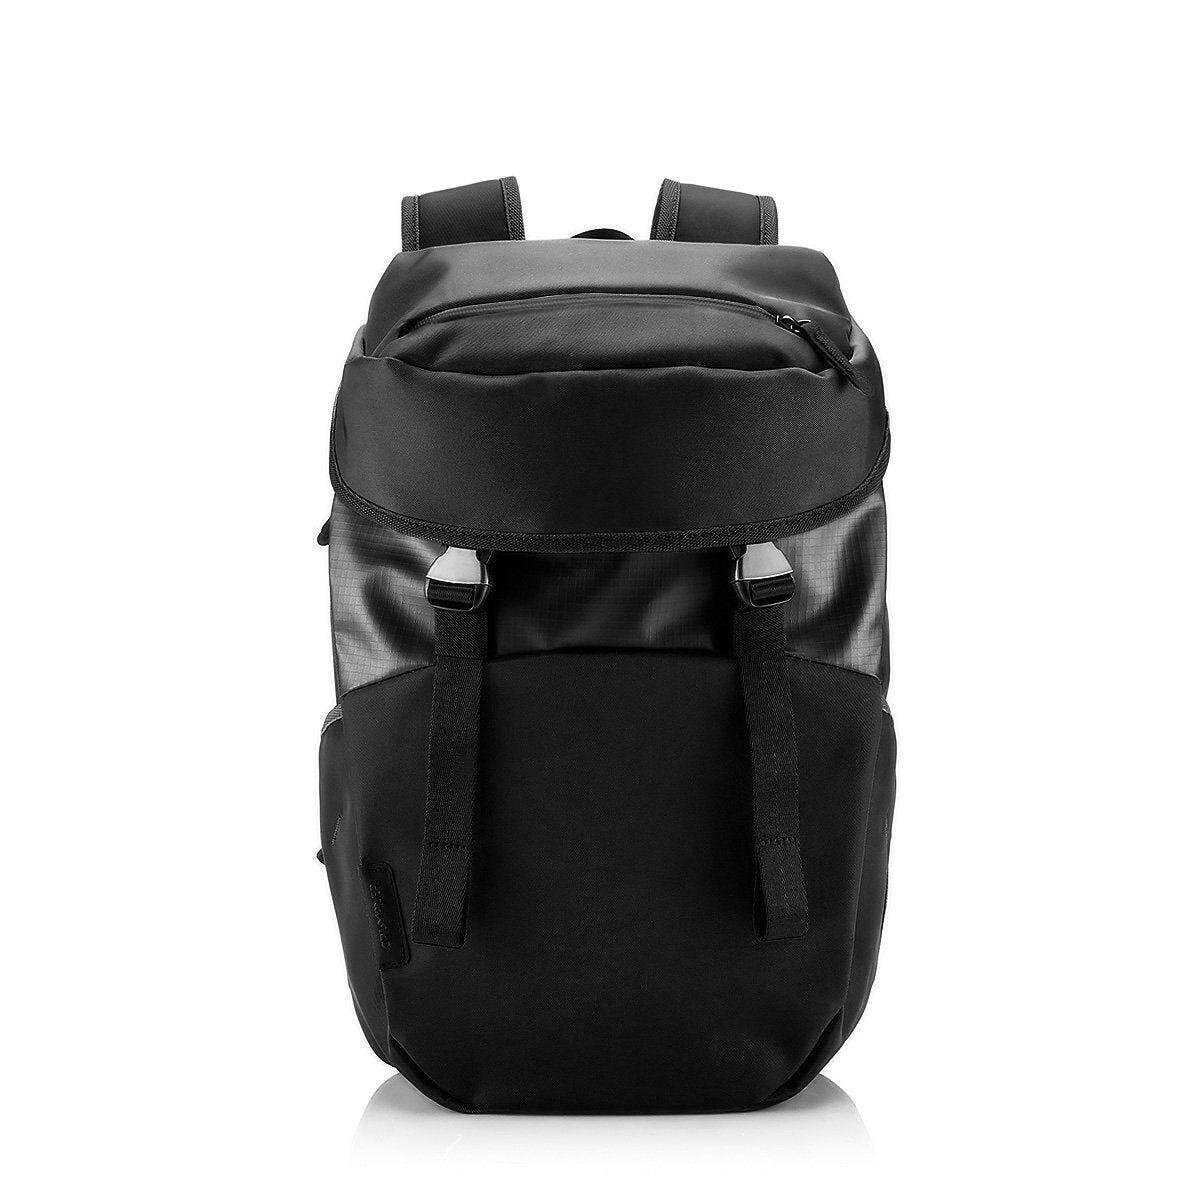 Crumpler Life Citizen Laptop-Rucksack schwarz 25.0 L